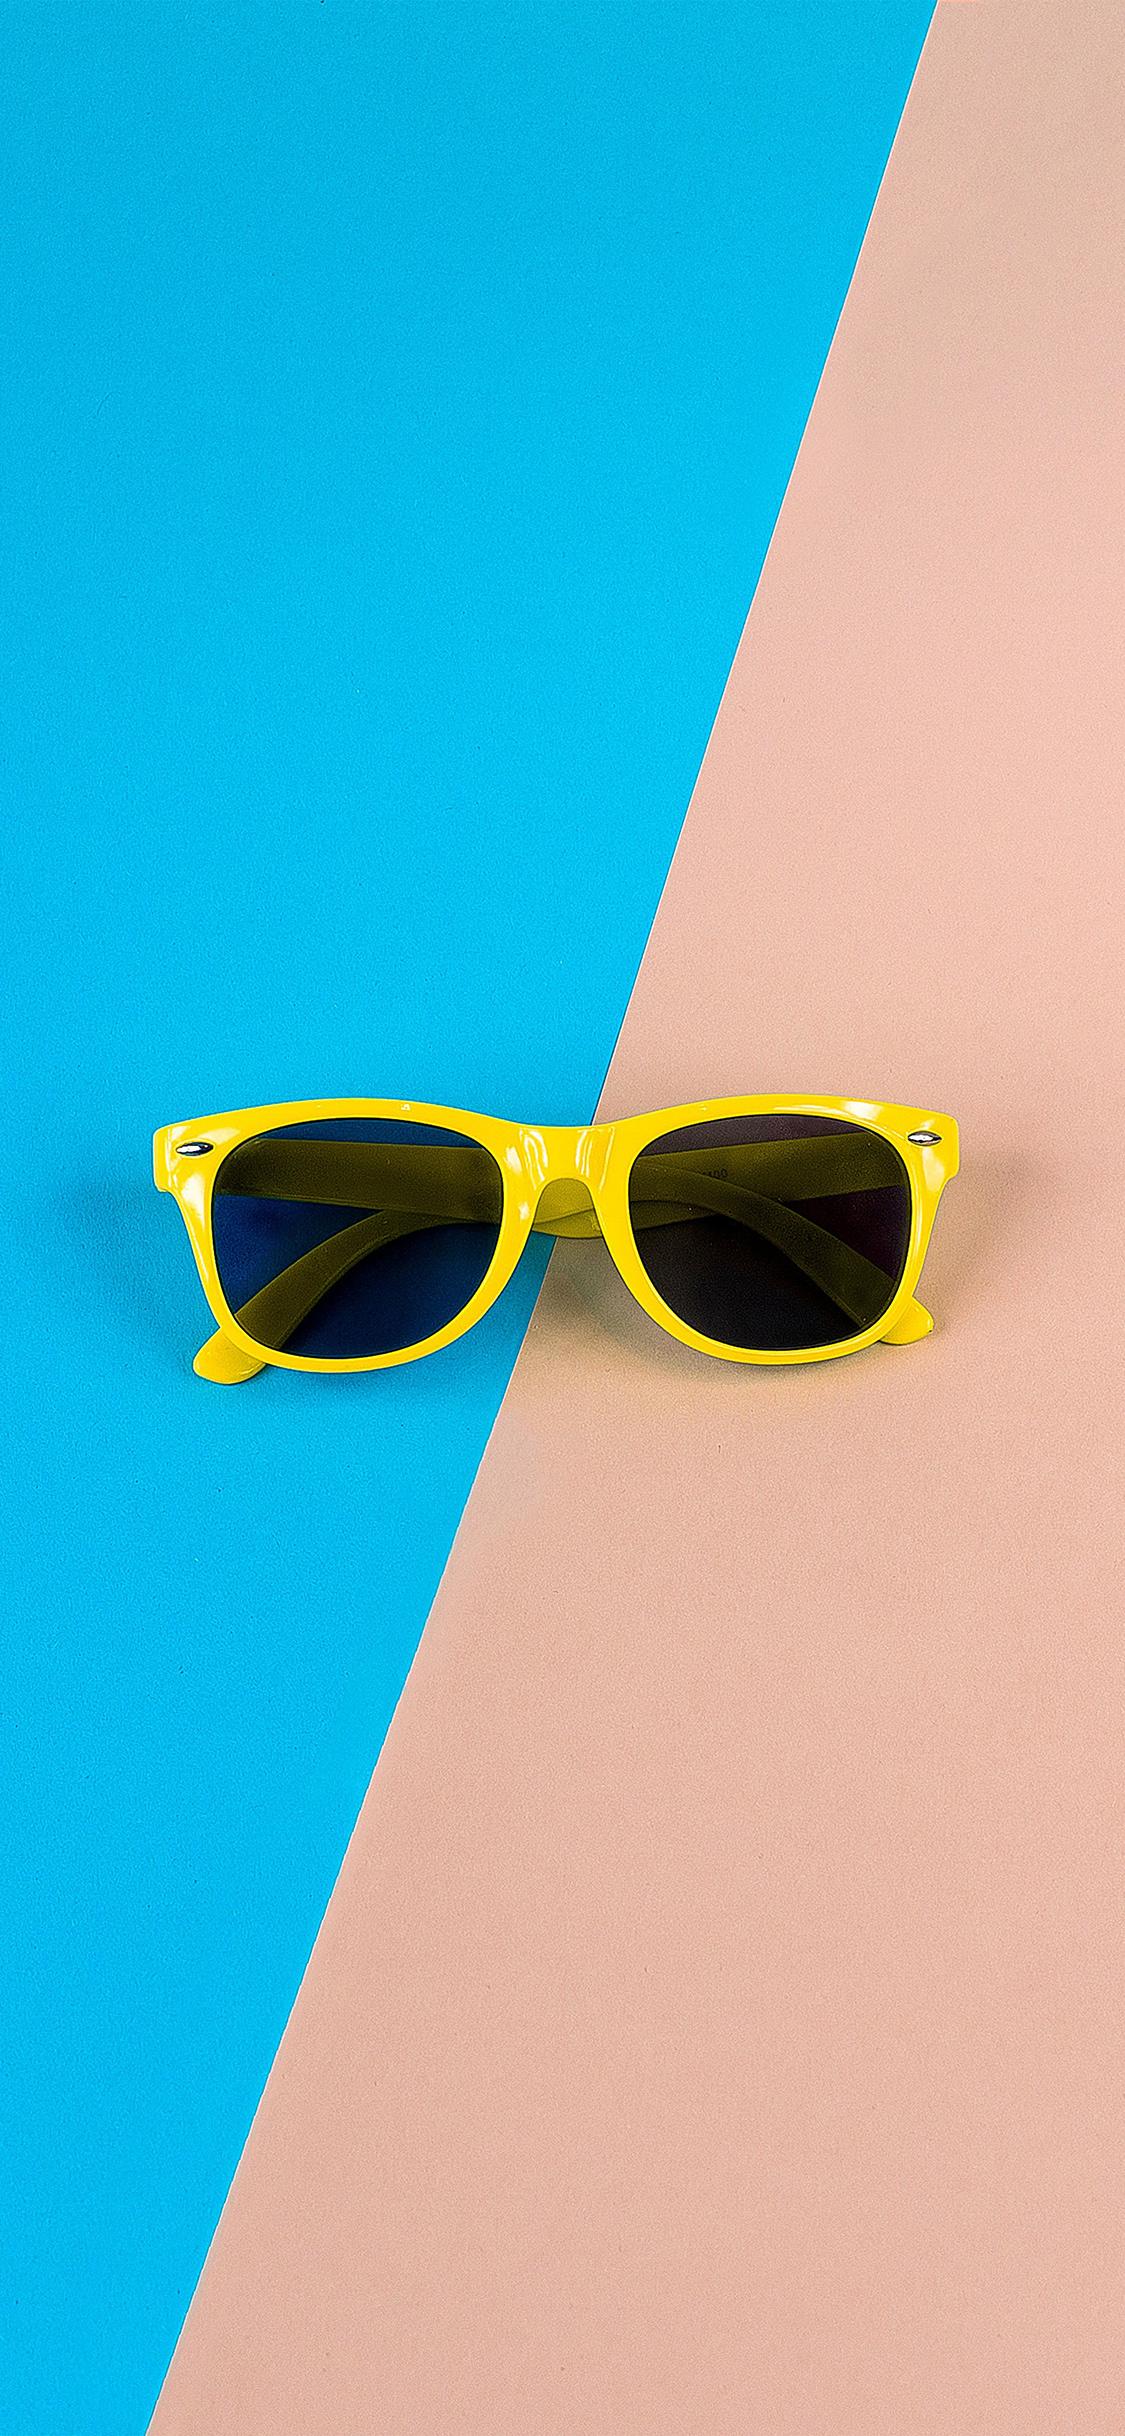 iPhoneXpapers.com-Apple-iPhone-wallpaper-nk47-minimal-glasses-pink-blue-yellow